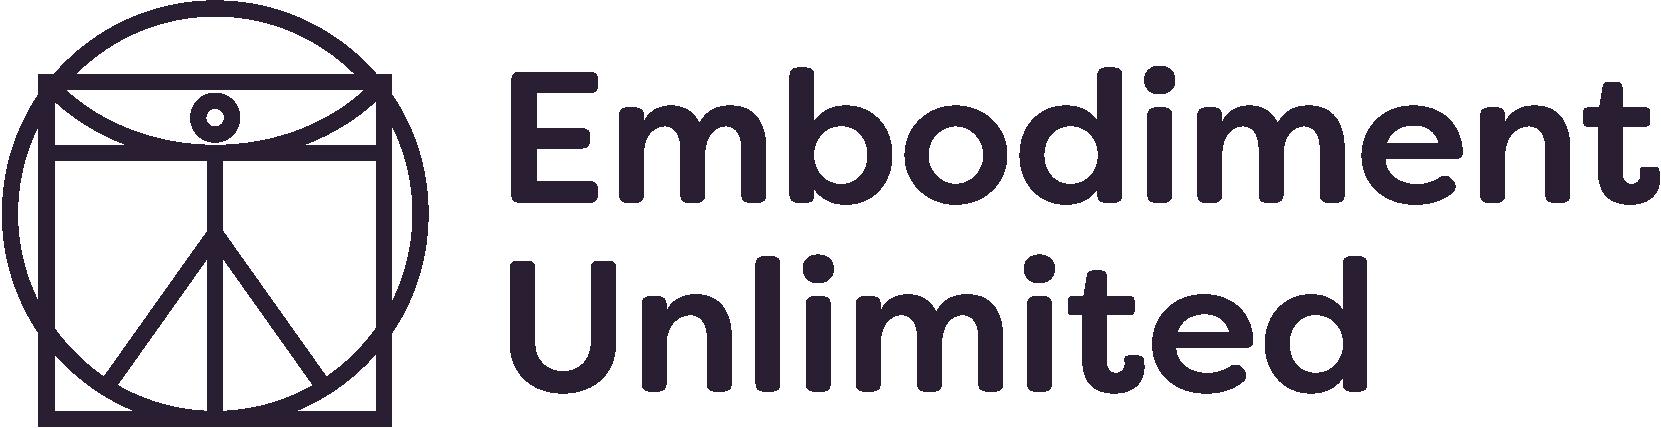 embodiment unlimited